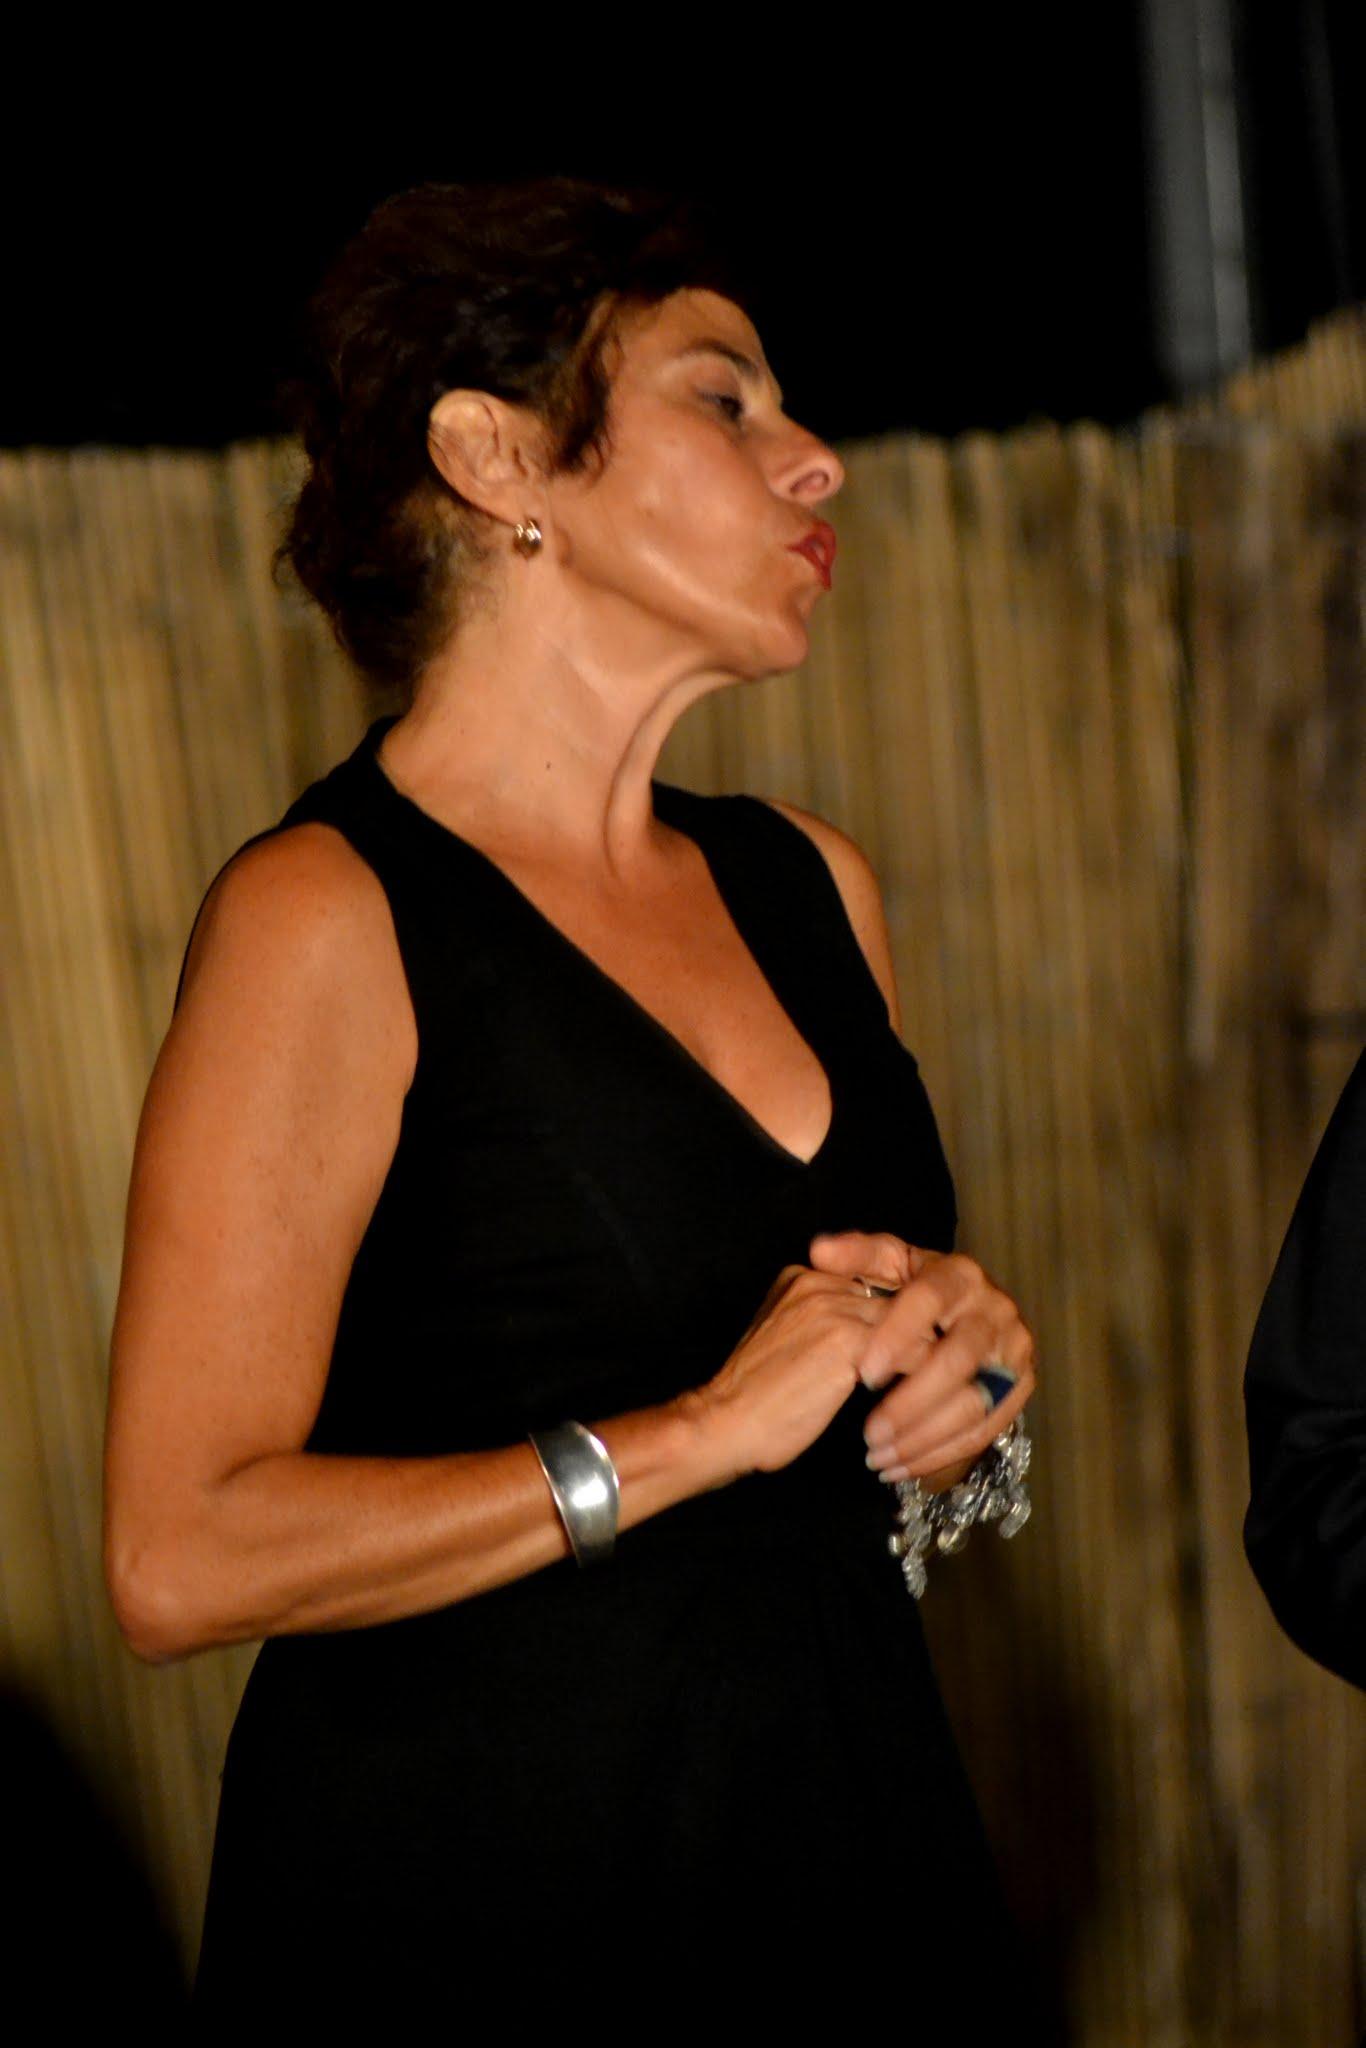 FCVT-2017-Marion tritta-Dame de chez Maxim (74)